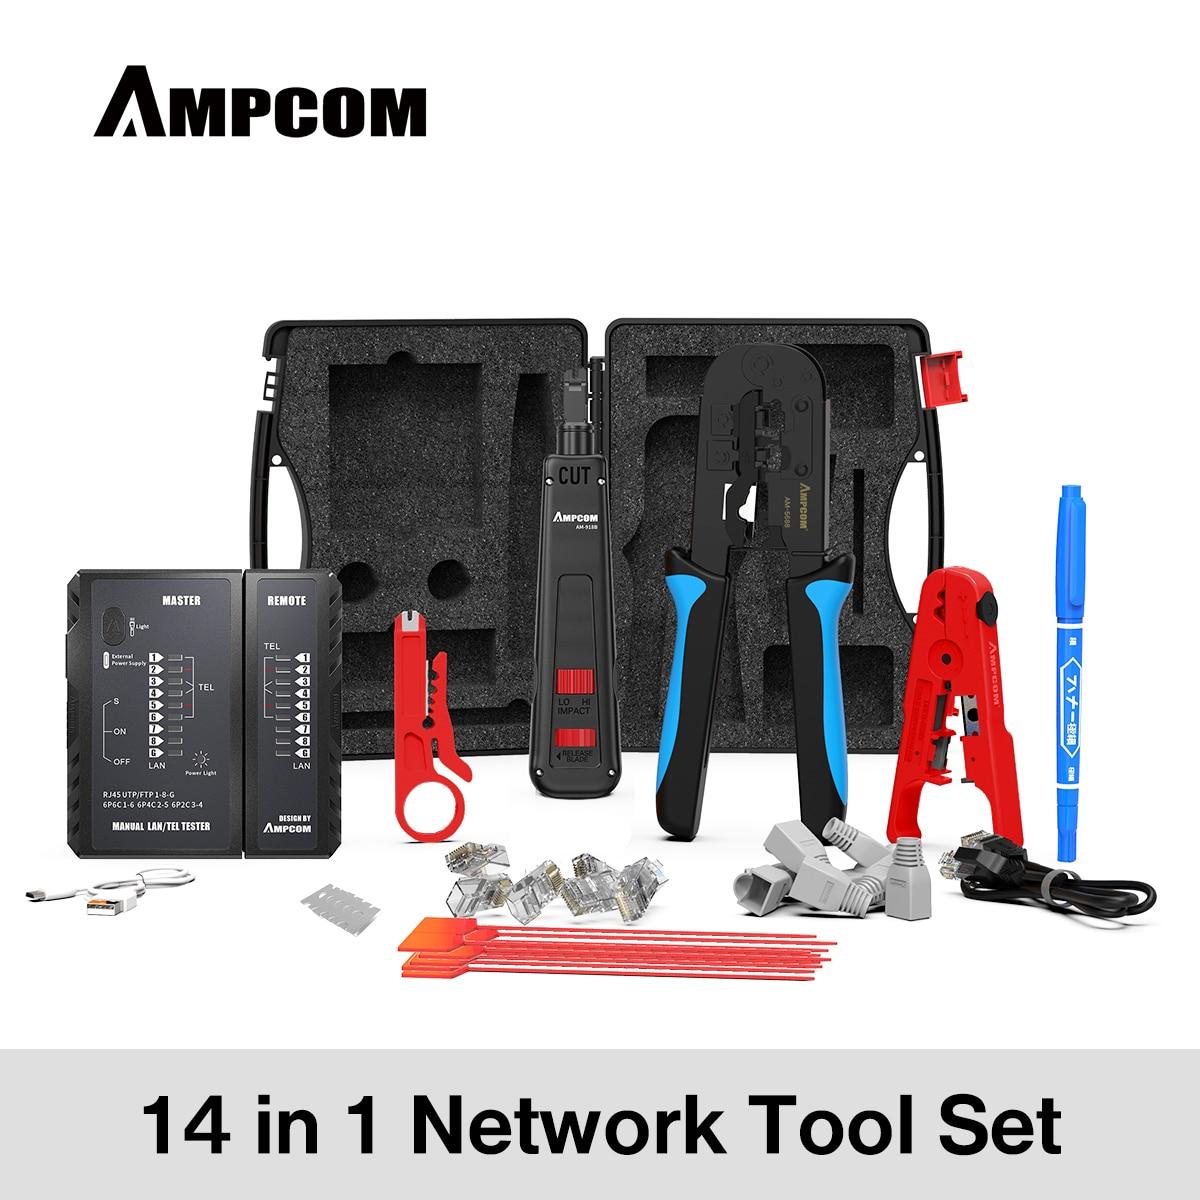 AMPCOM-مجموعة أدوات شبكة احترافية 14 في 1 ، أداة اختبار كابل إيثرنت ، موصلات Rj45 Rj11 Cat6 ، مكشكش الكابلات ، كماشة متجرد